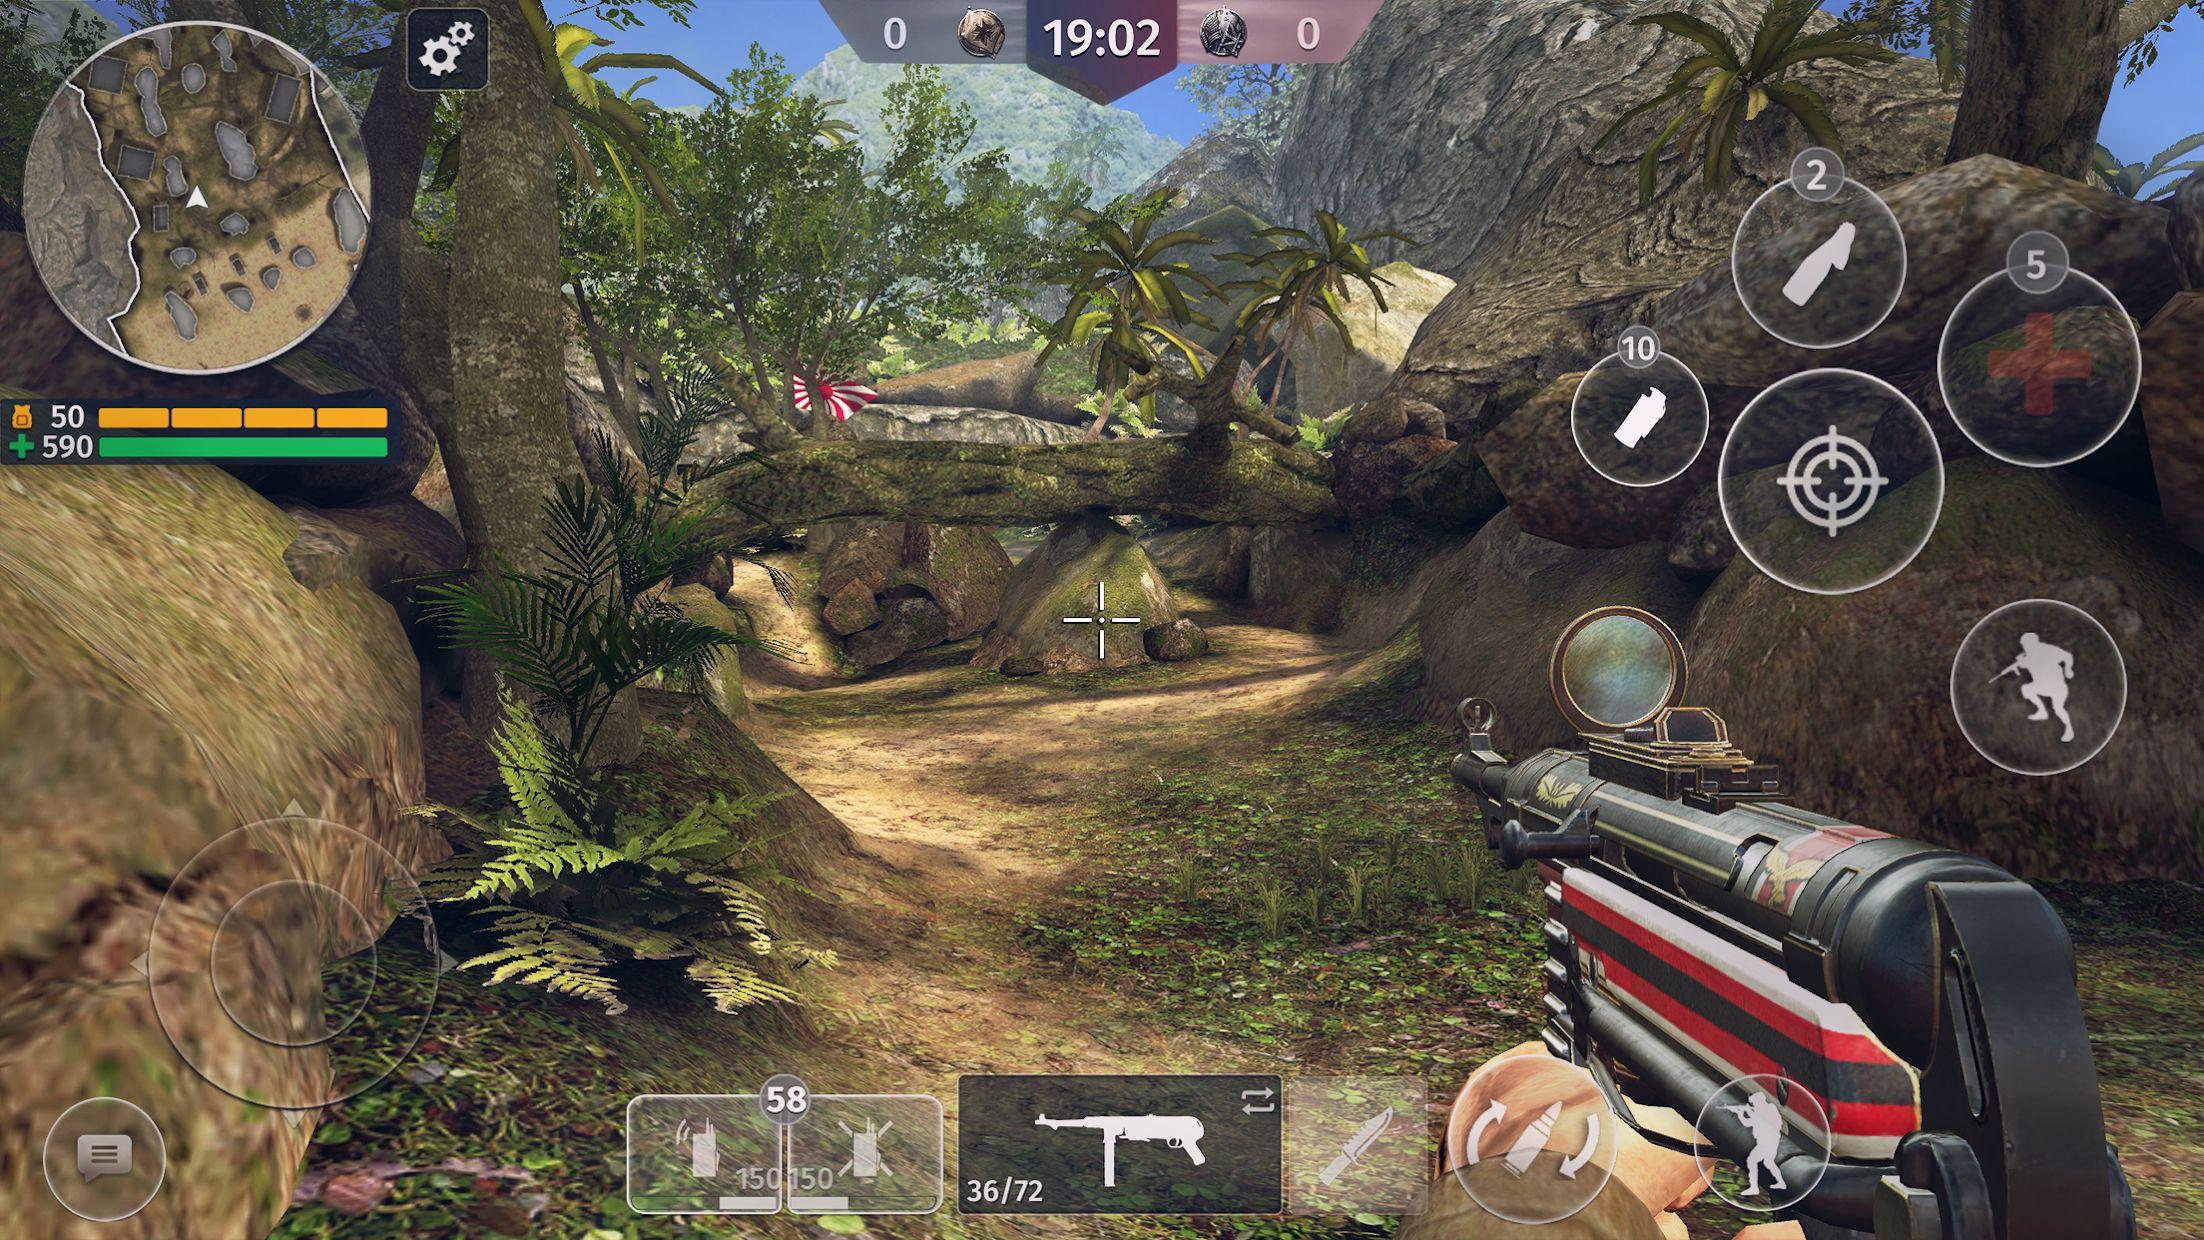 World War 2 - Battle Combat (Online FPS 游戏) 游戏截图1